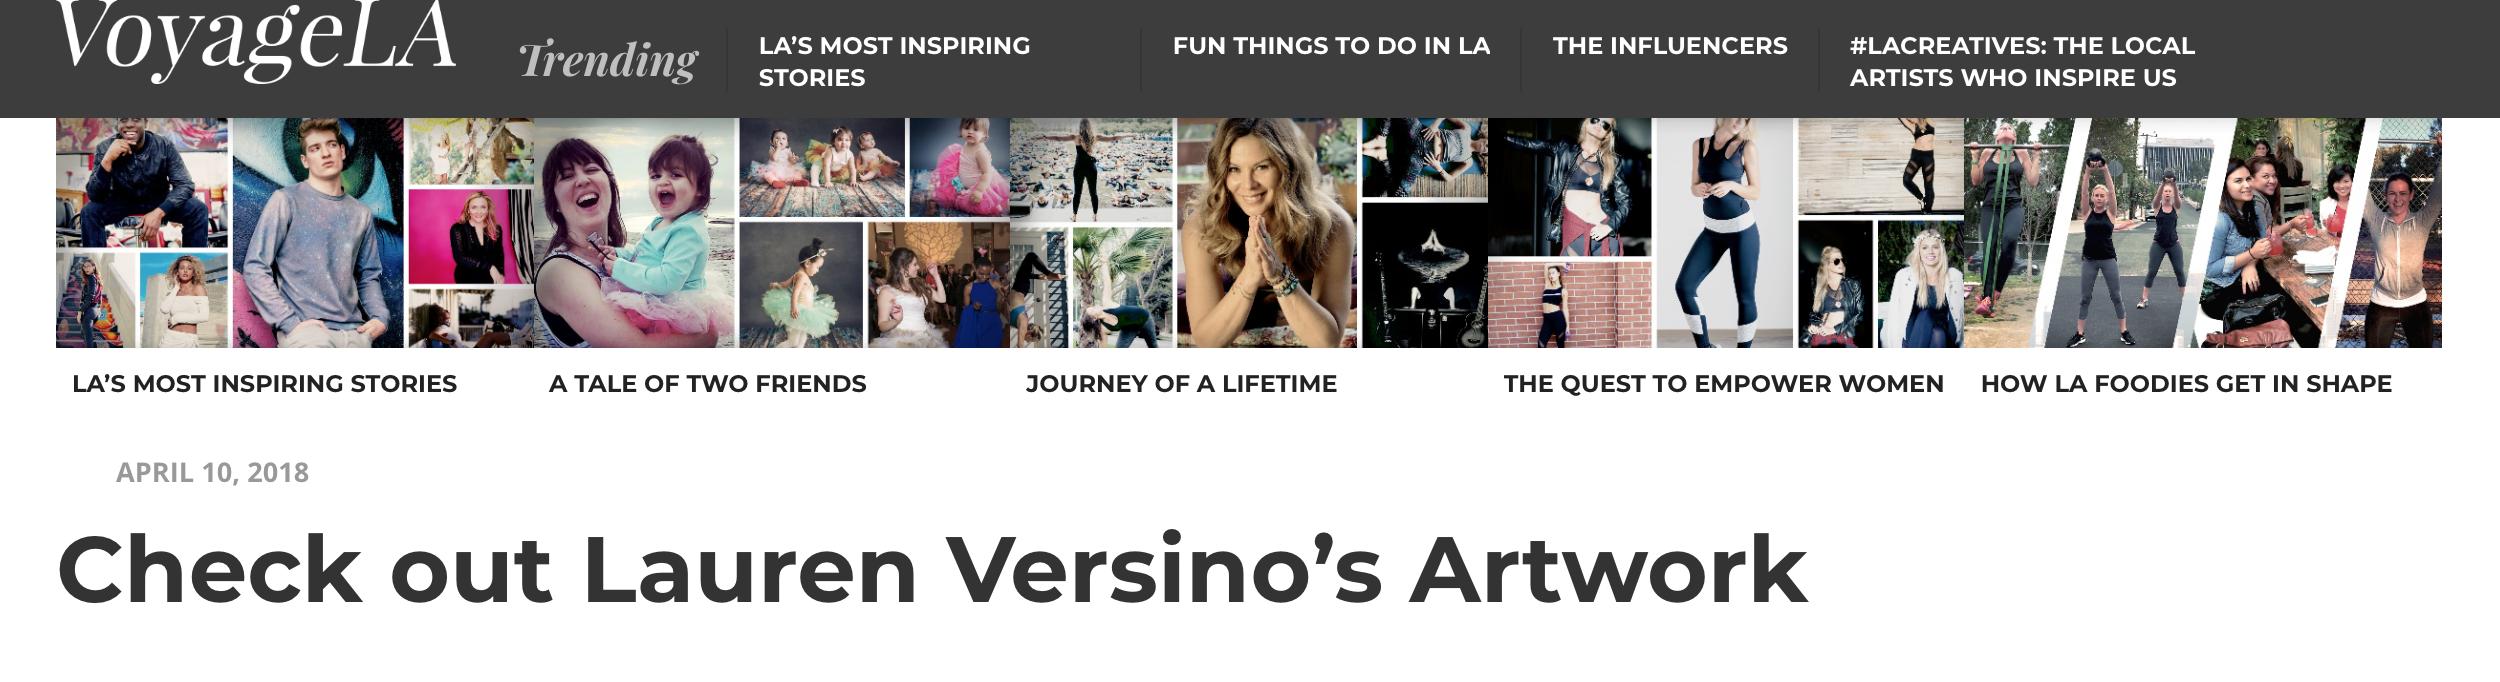 VoyageLA Lauren Versino featured artist bio